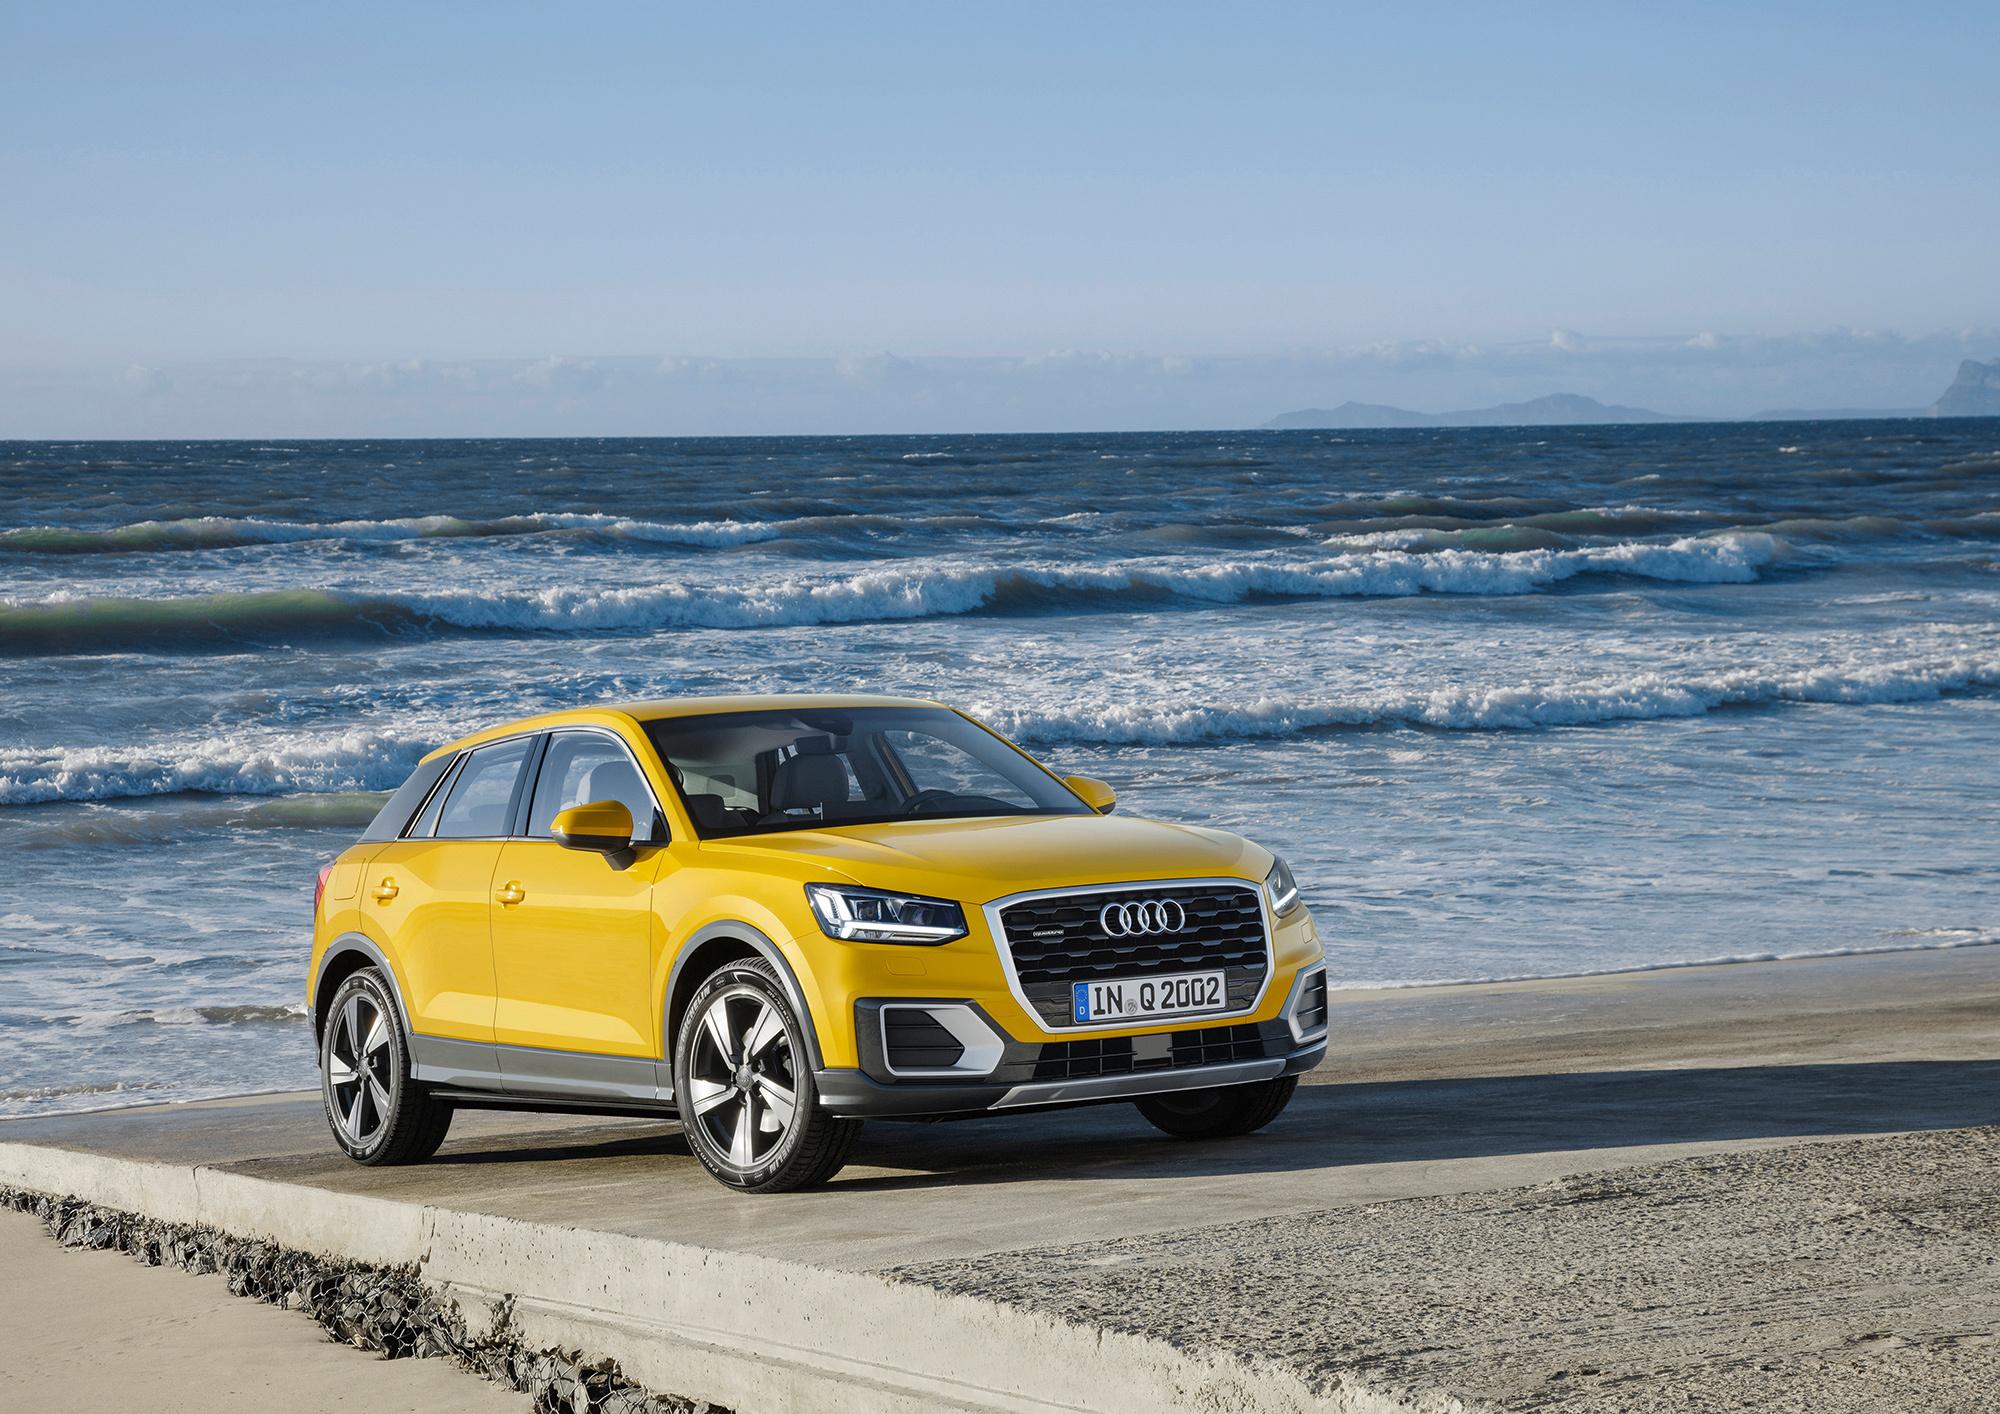 Audi Q2 Wallpapers HD